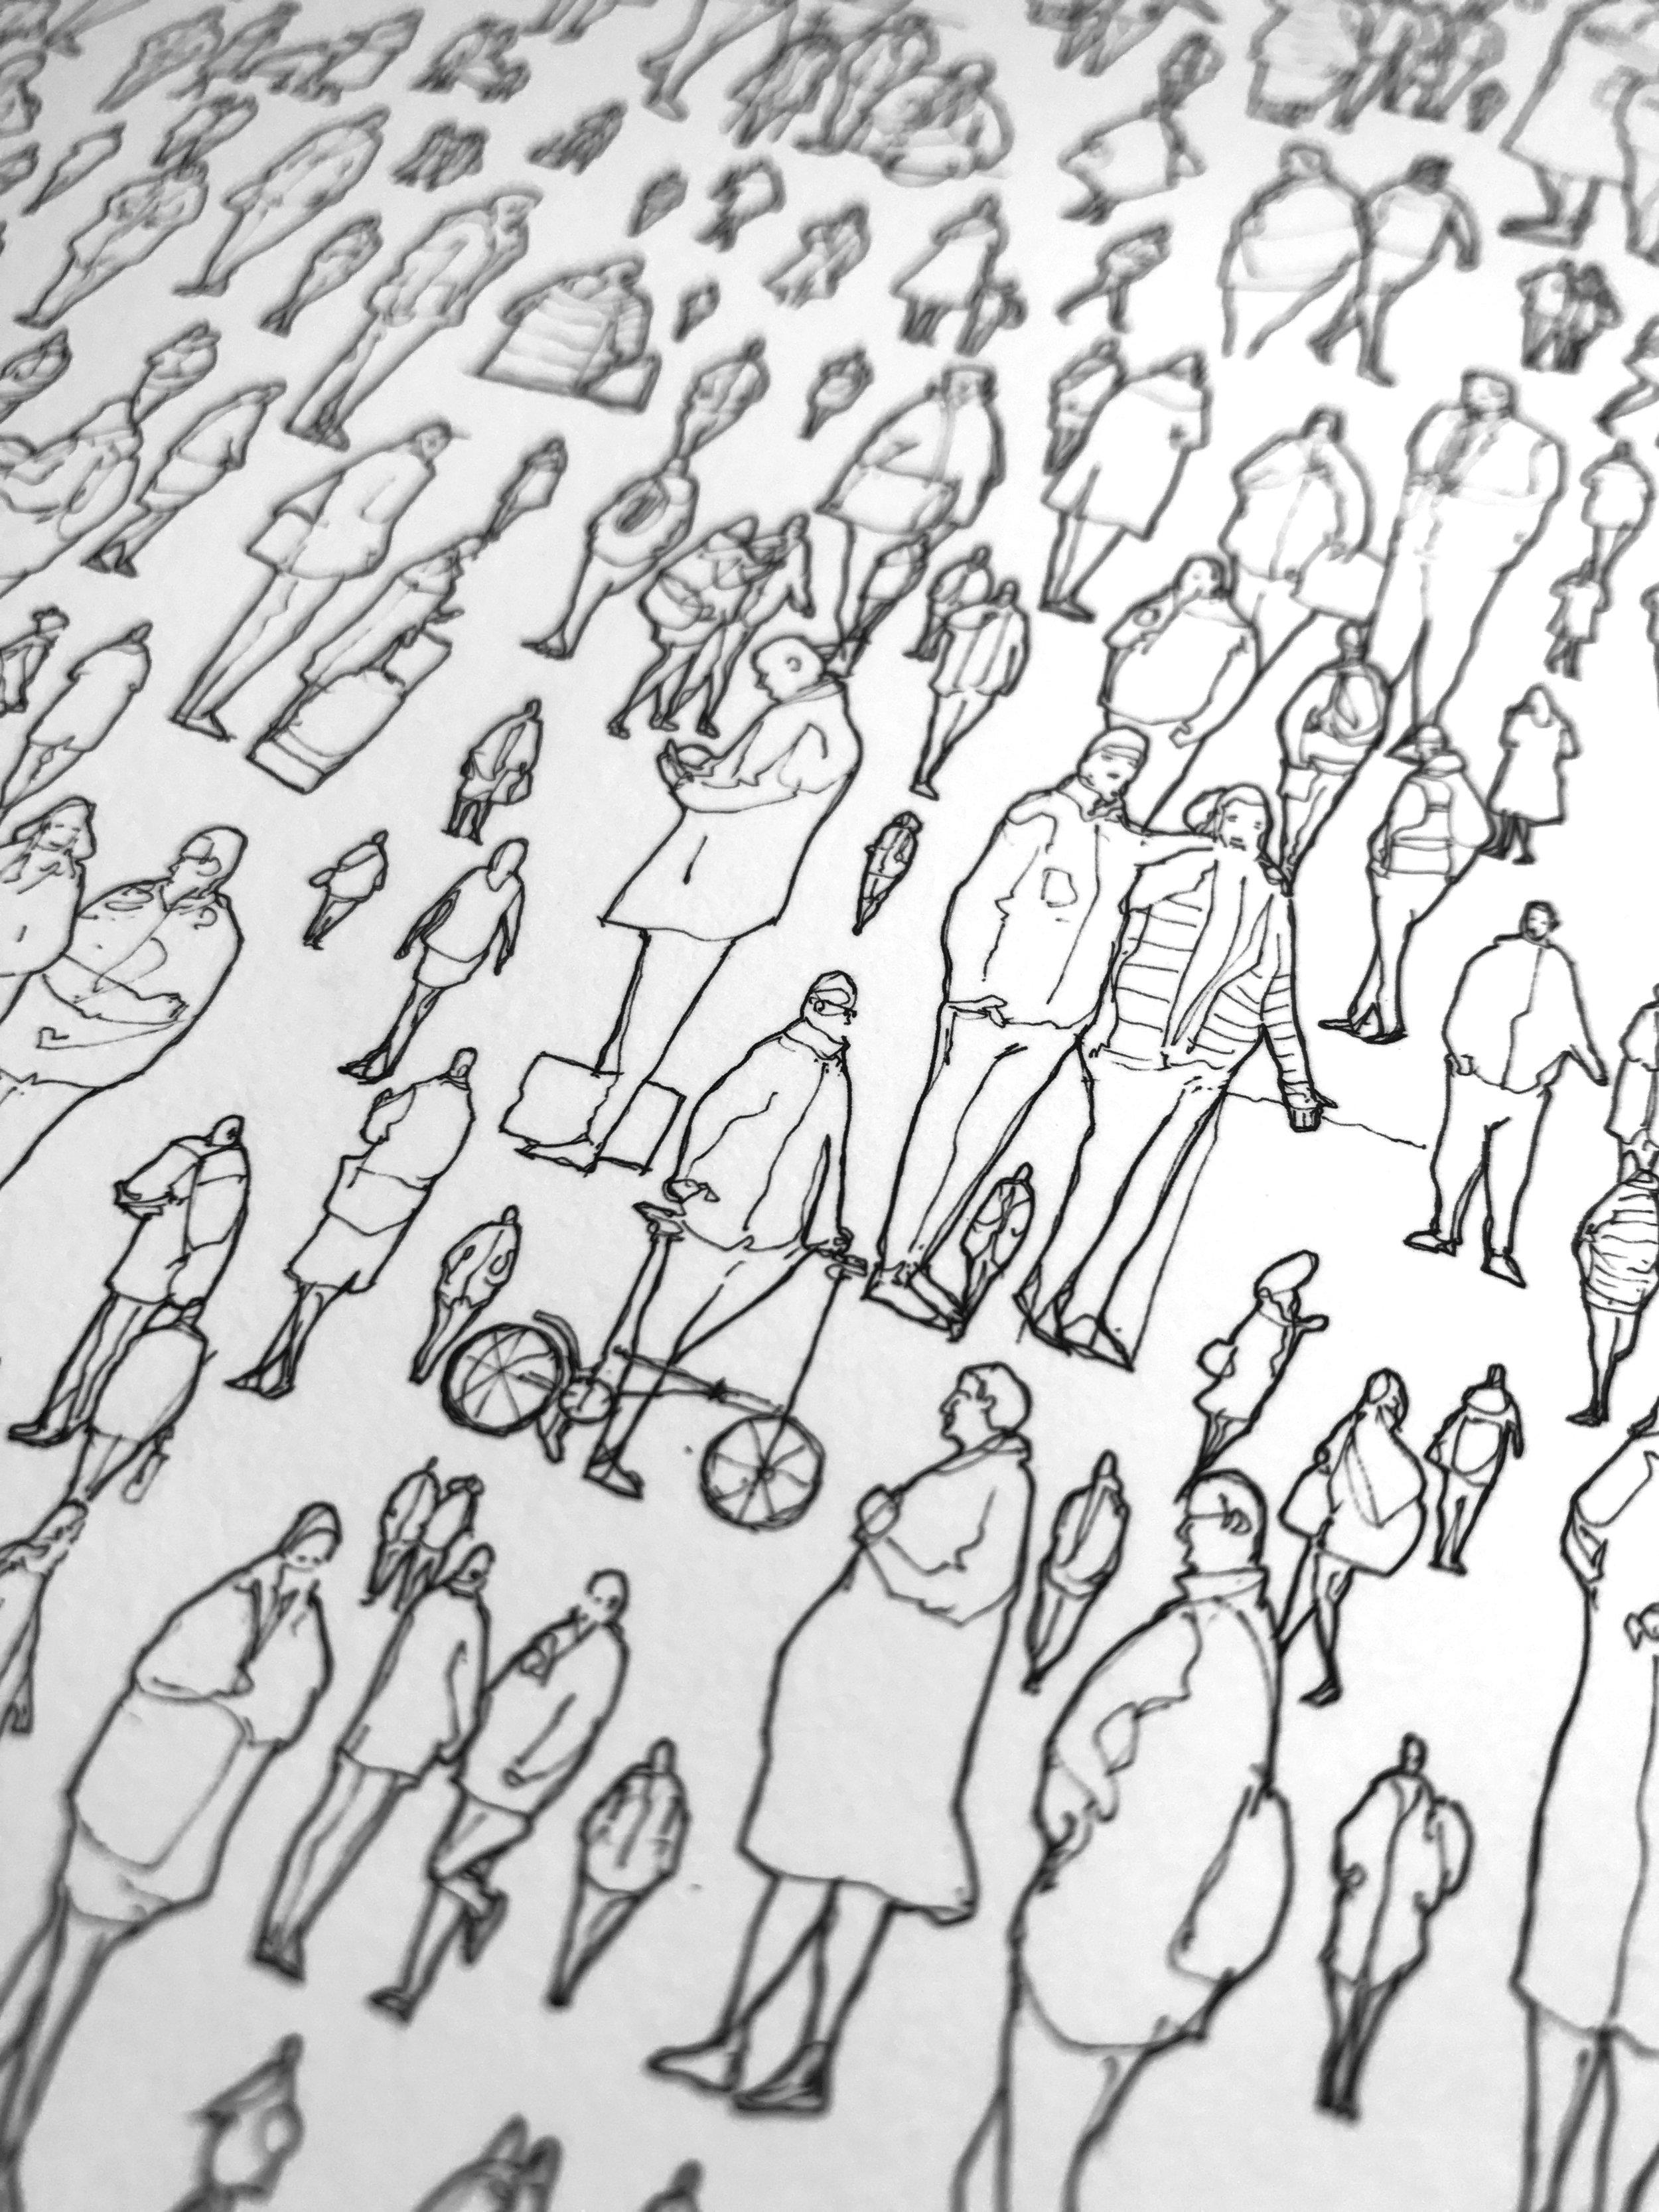 Farringdon -Peoplewatching -Luke Adam Hawker-close up.jpg